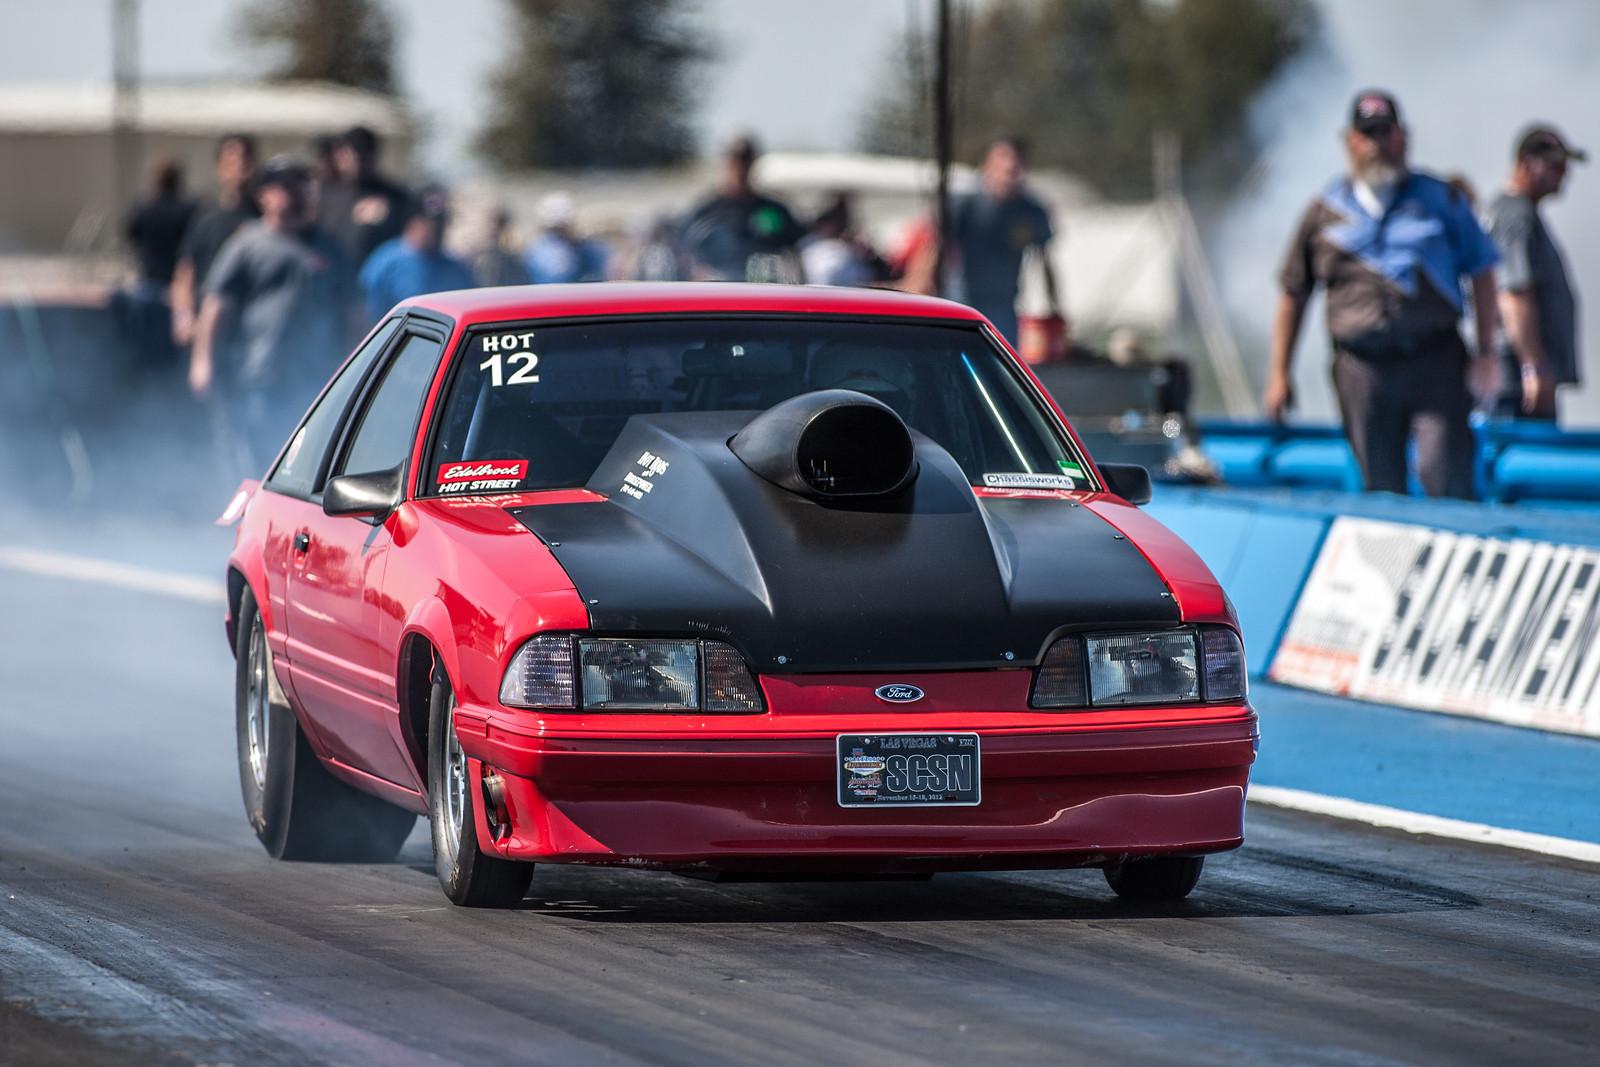 NHRA drag racing race hot rod rods ford mustang ri wallpaper 1600x1067